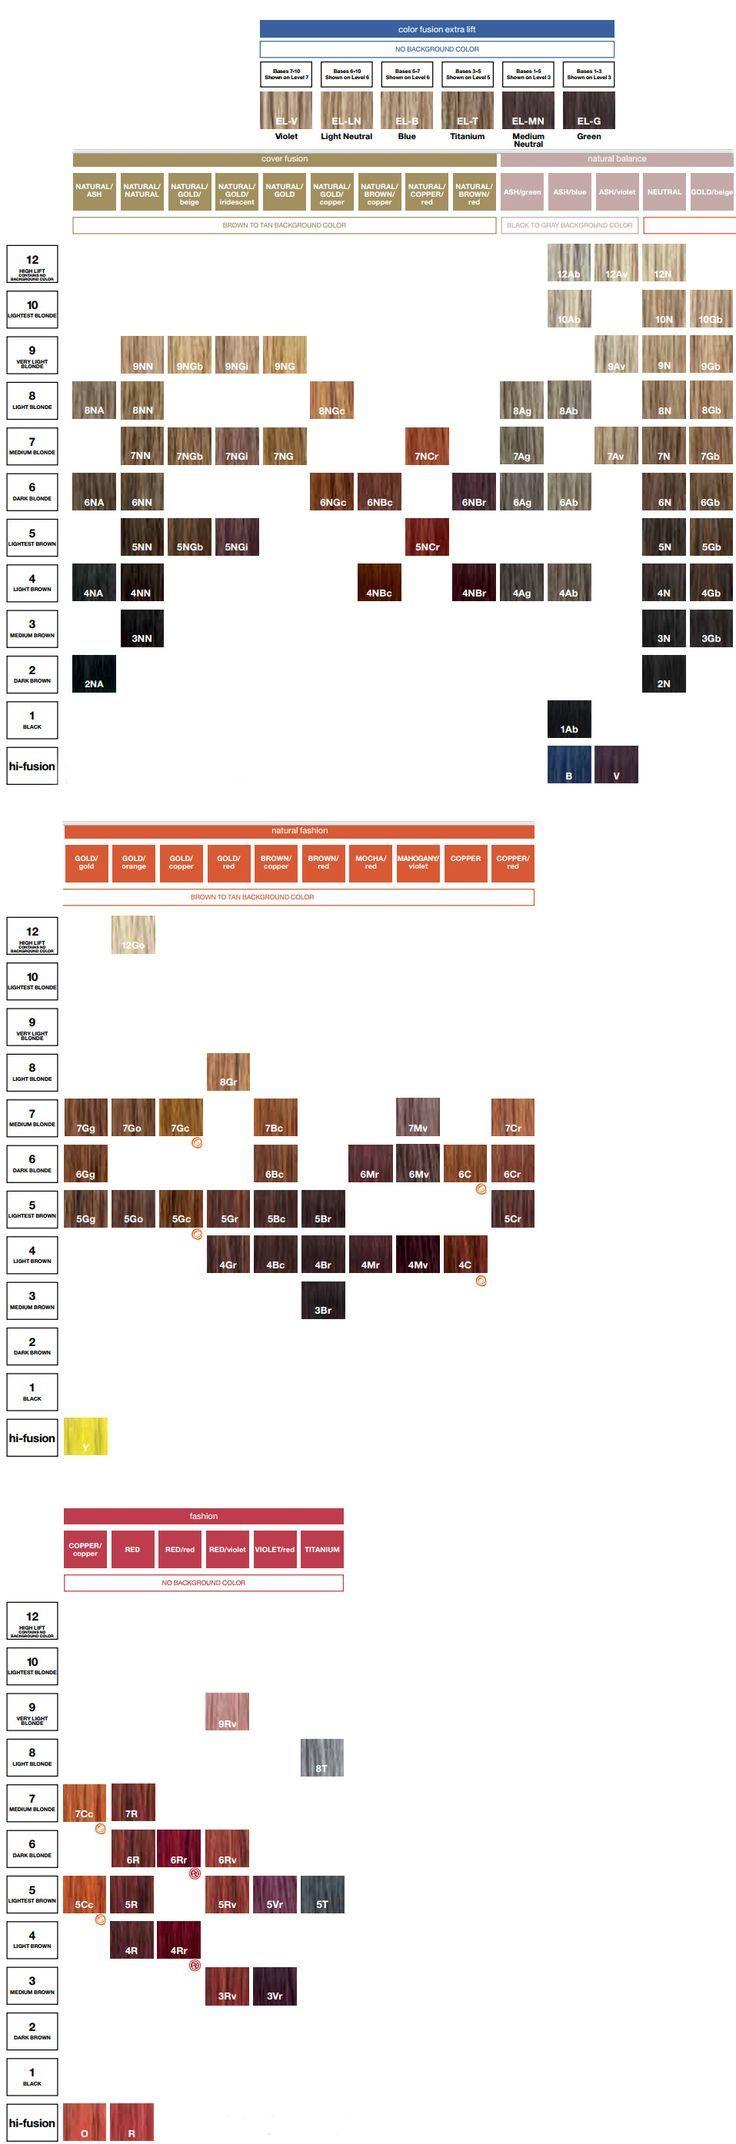 Redken Color Fusion Color Chart Google Search Redken Chromatics Color Chart Redken Hair Color Redken Hair Color Chart